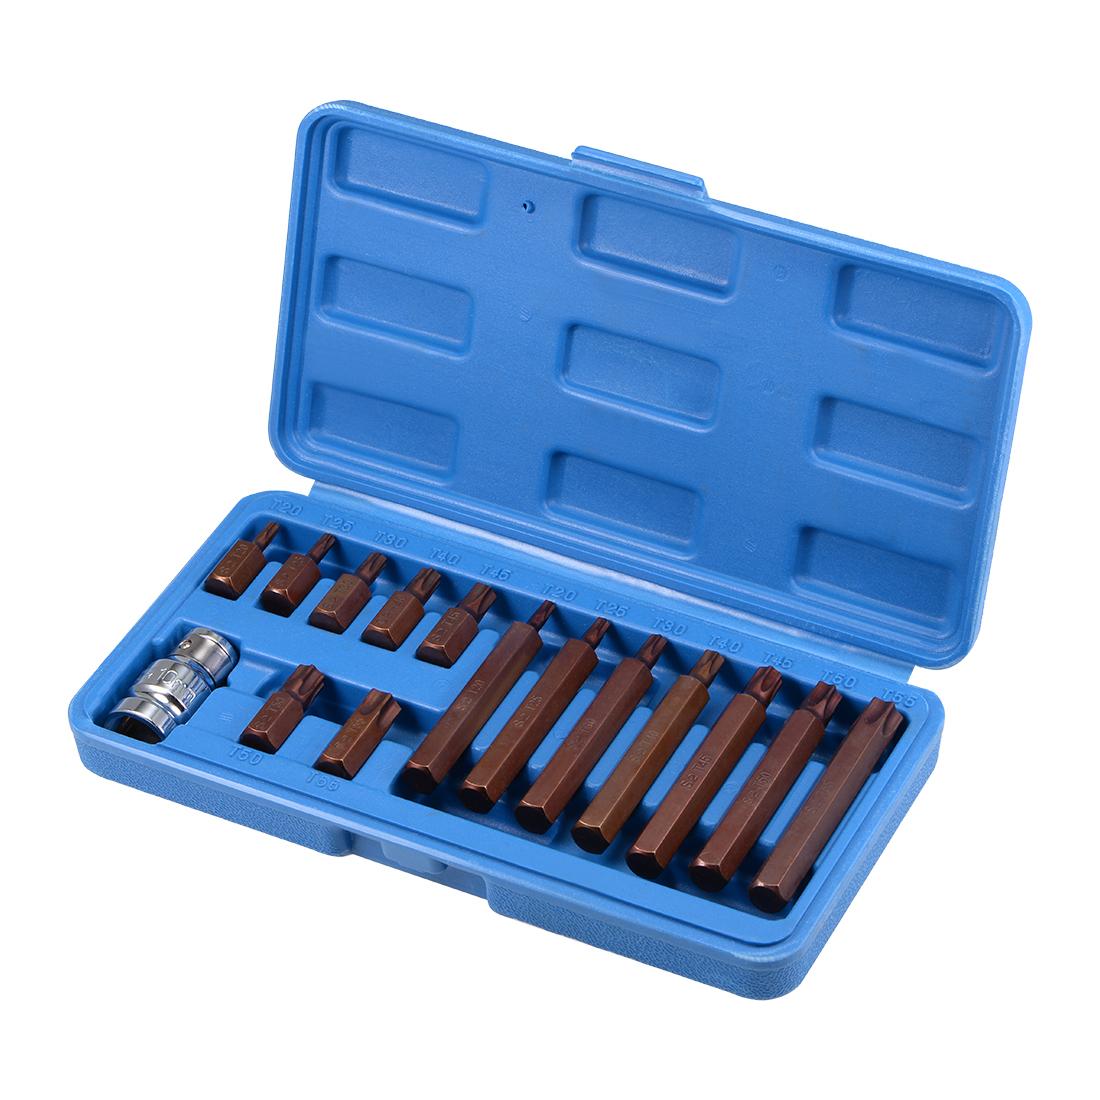 1/2-Inch Drive Socket and Bit Set T20 T25 T30 T40 T45 T50 T55 S2 Steel 15 Pcs